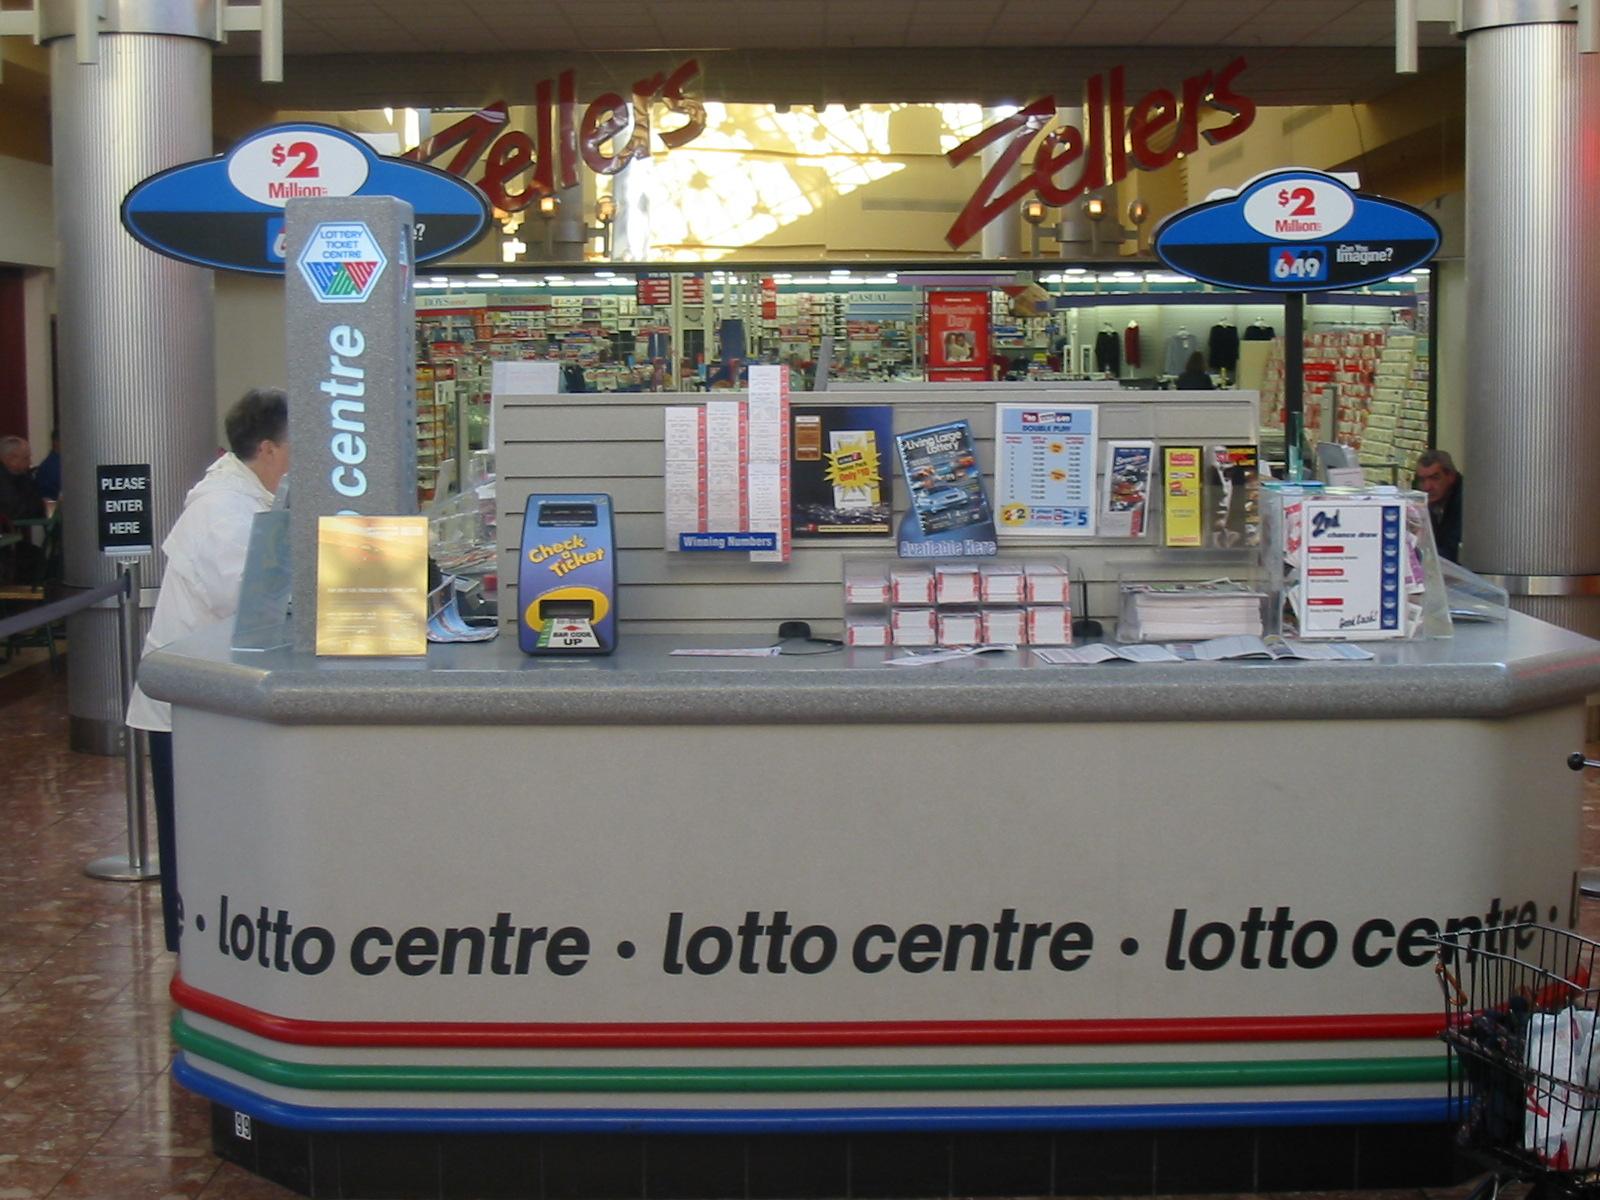 BC Lottery Wins Highest Award